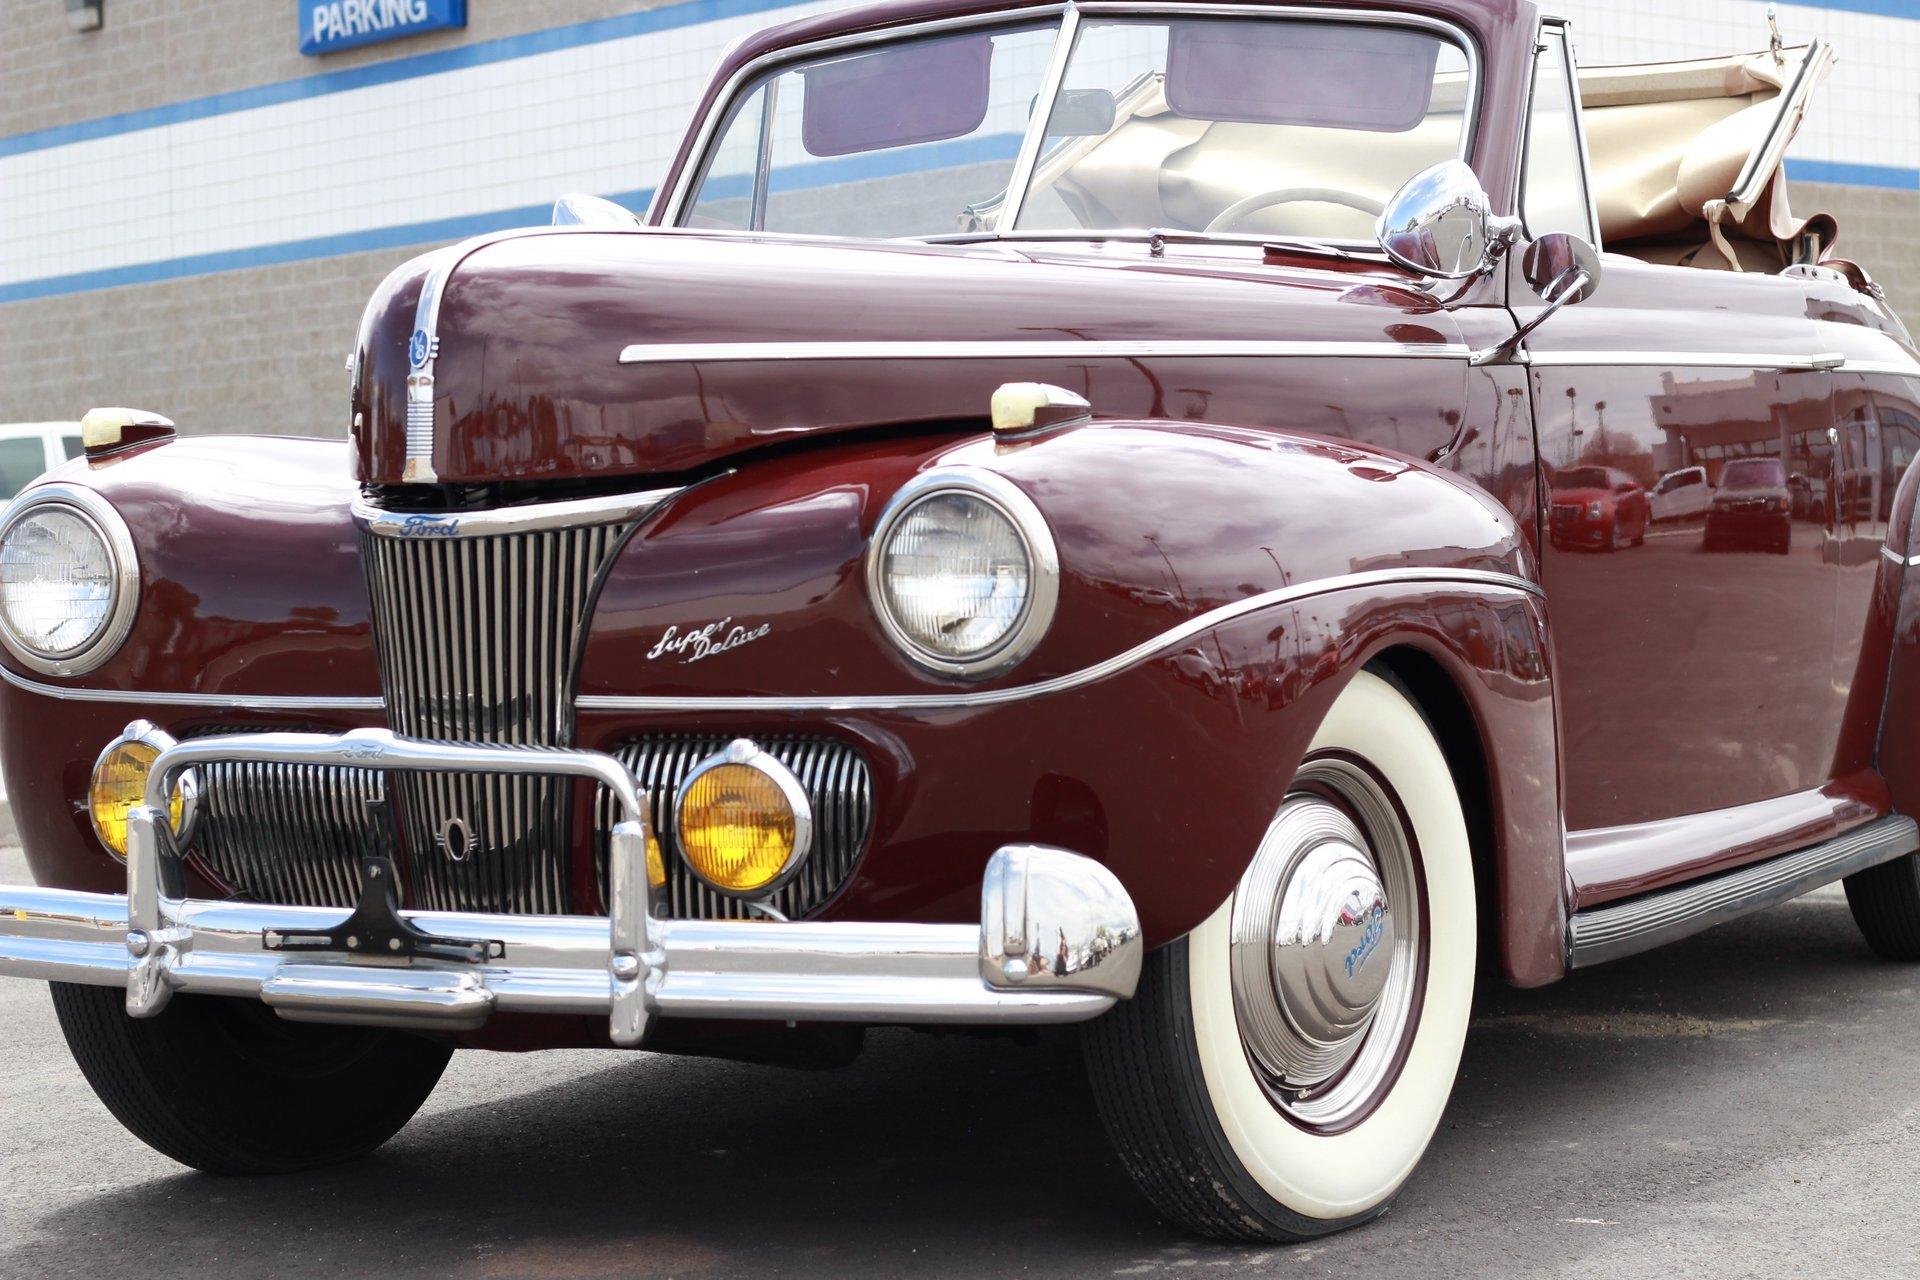 1941 Ford Super Deluxe For Sale 49732 Mcg Mercury Flathead Engine